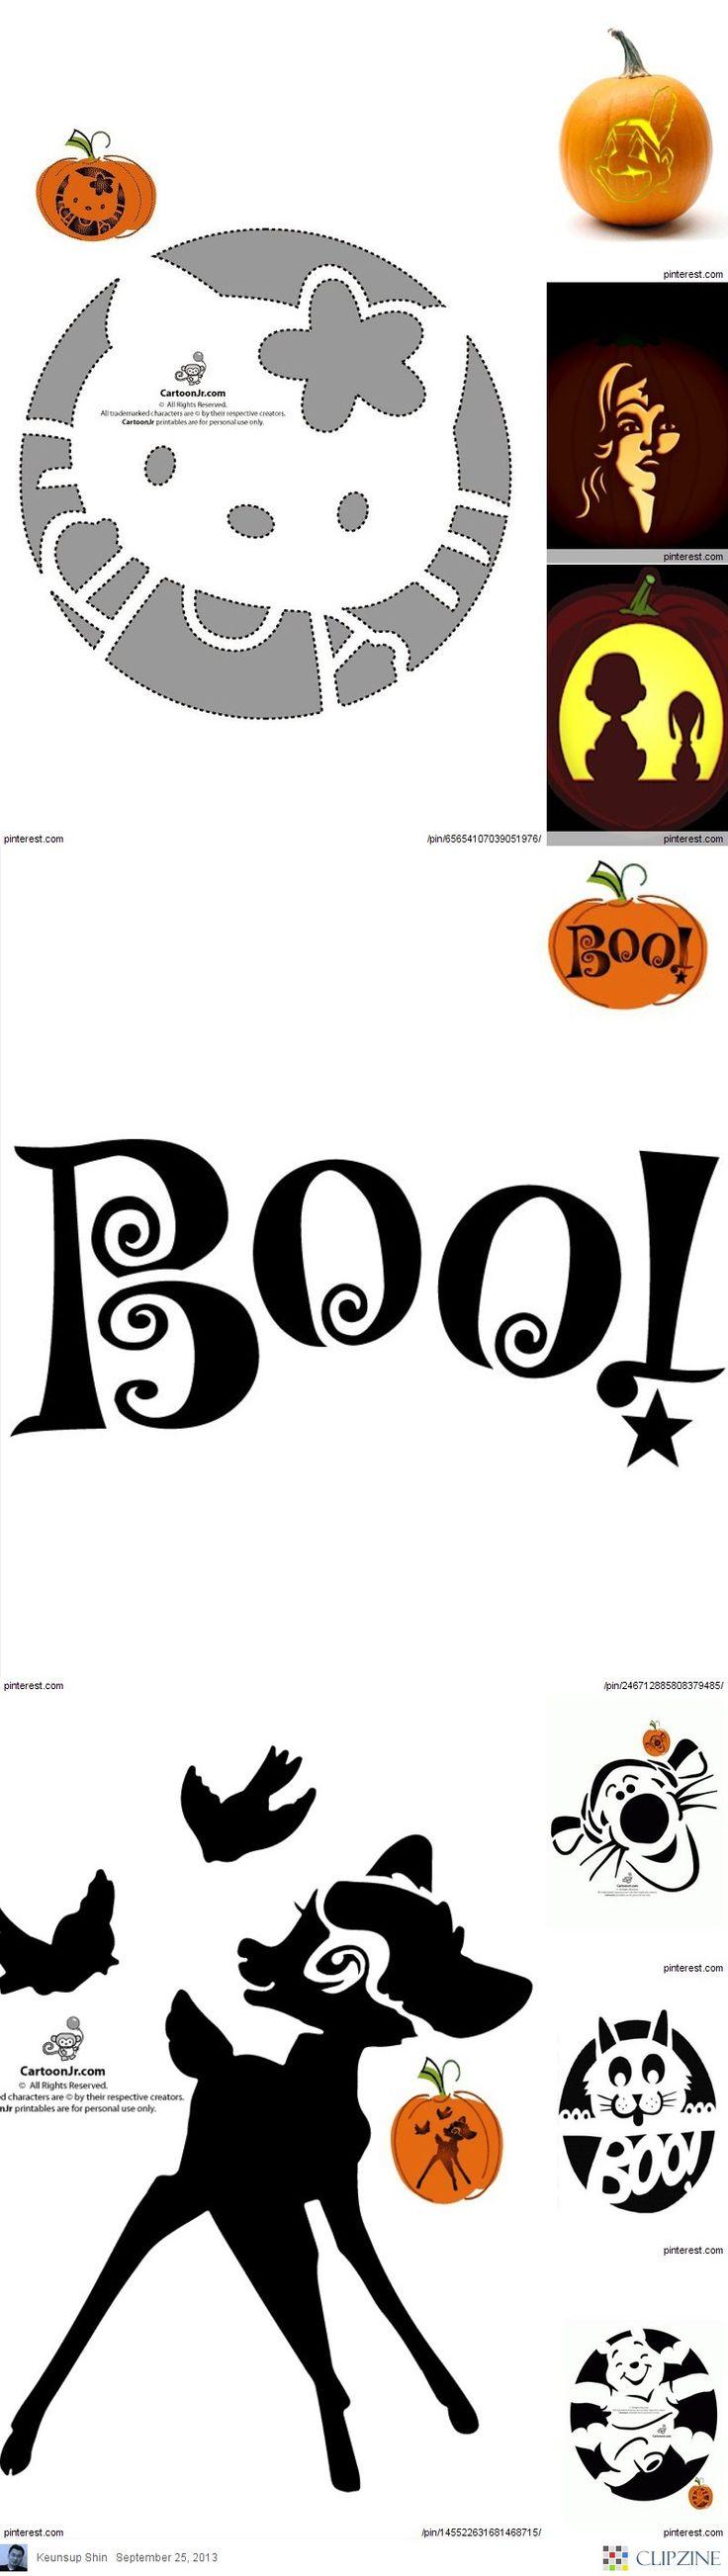 Halloween Pumpkin Stencils... link for these & more ideas:    http://clipzine.me/keunsupShin/clipzine/13425679053978814774/Halloween-Pumpkin-Stencils